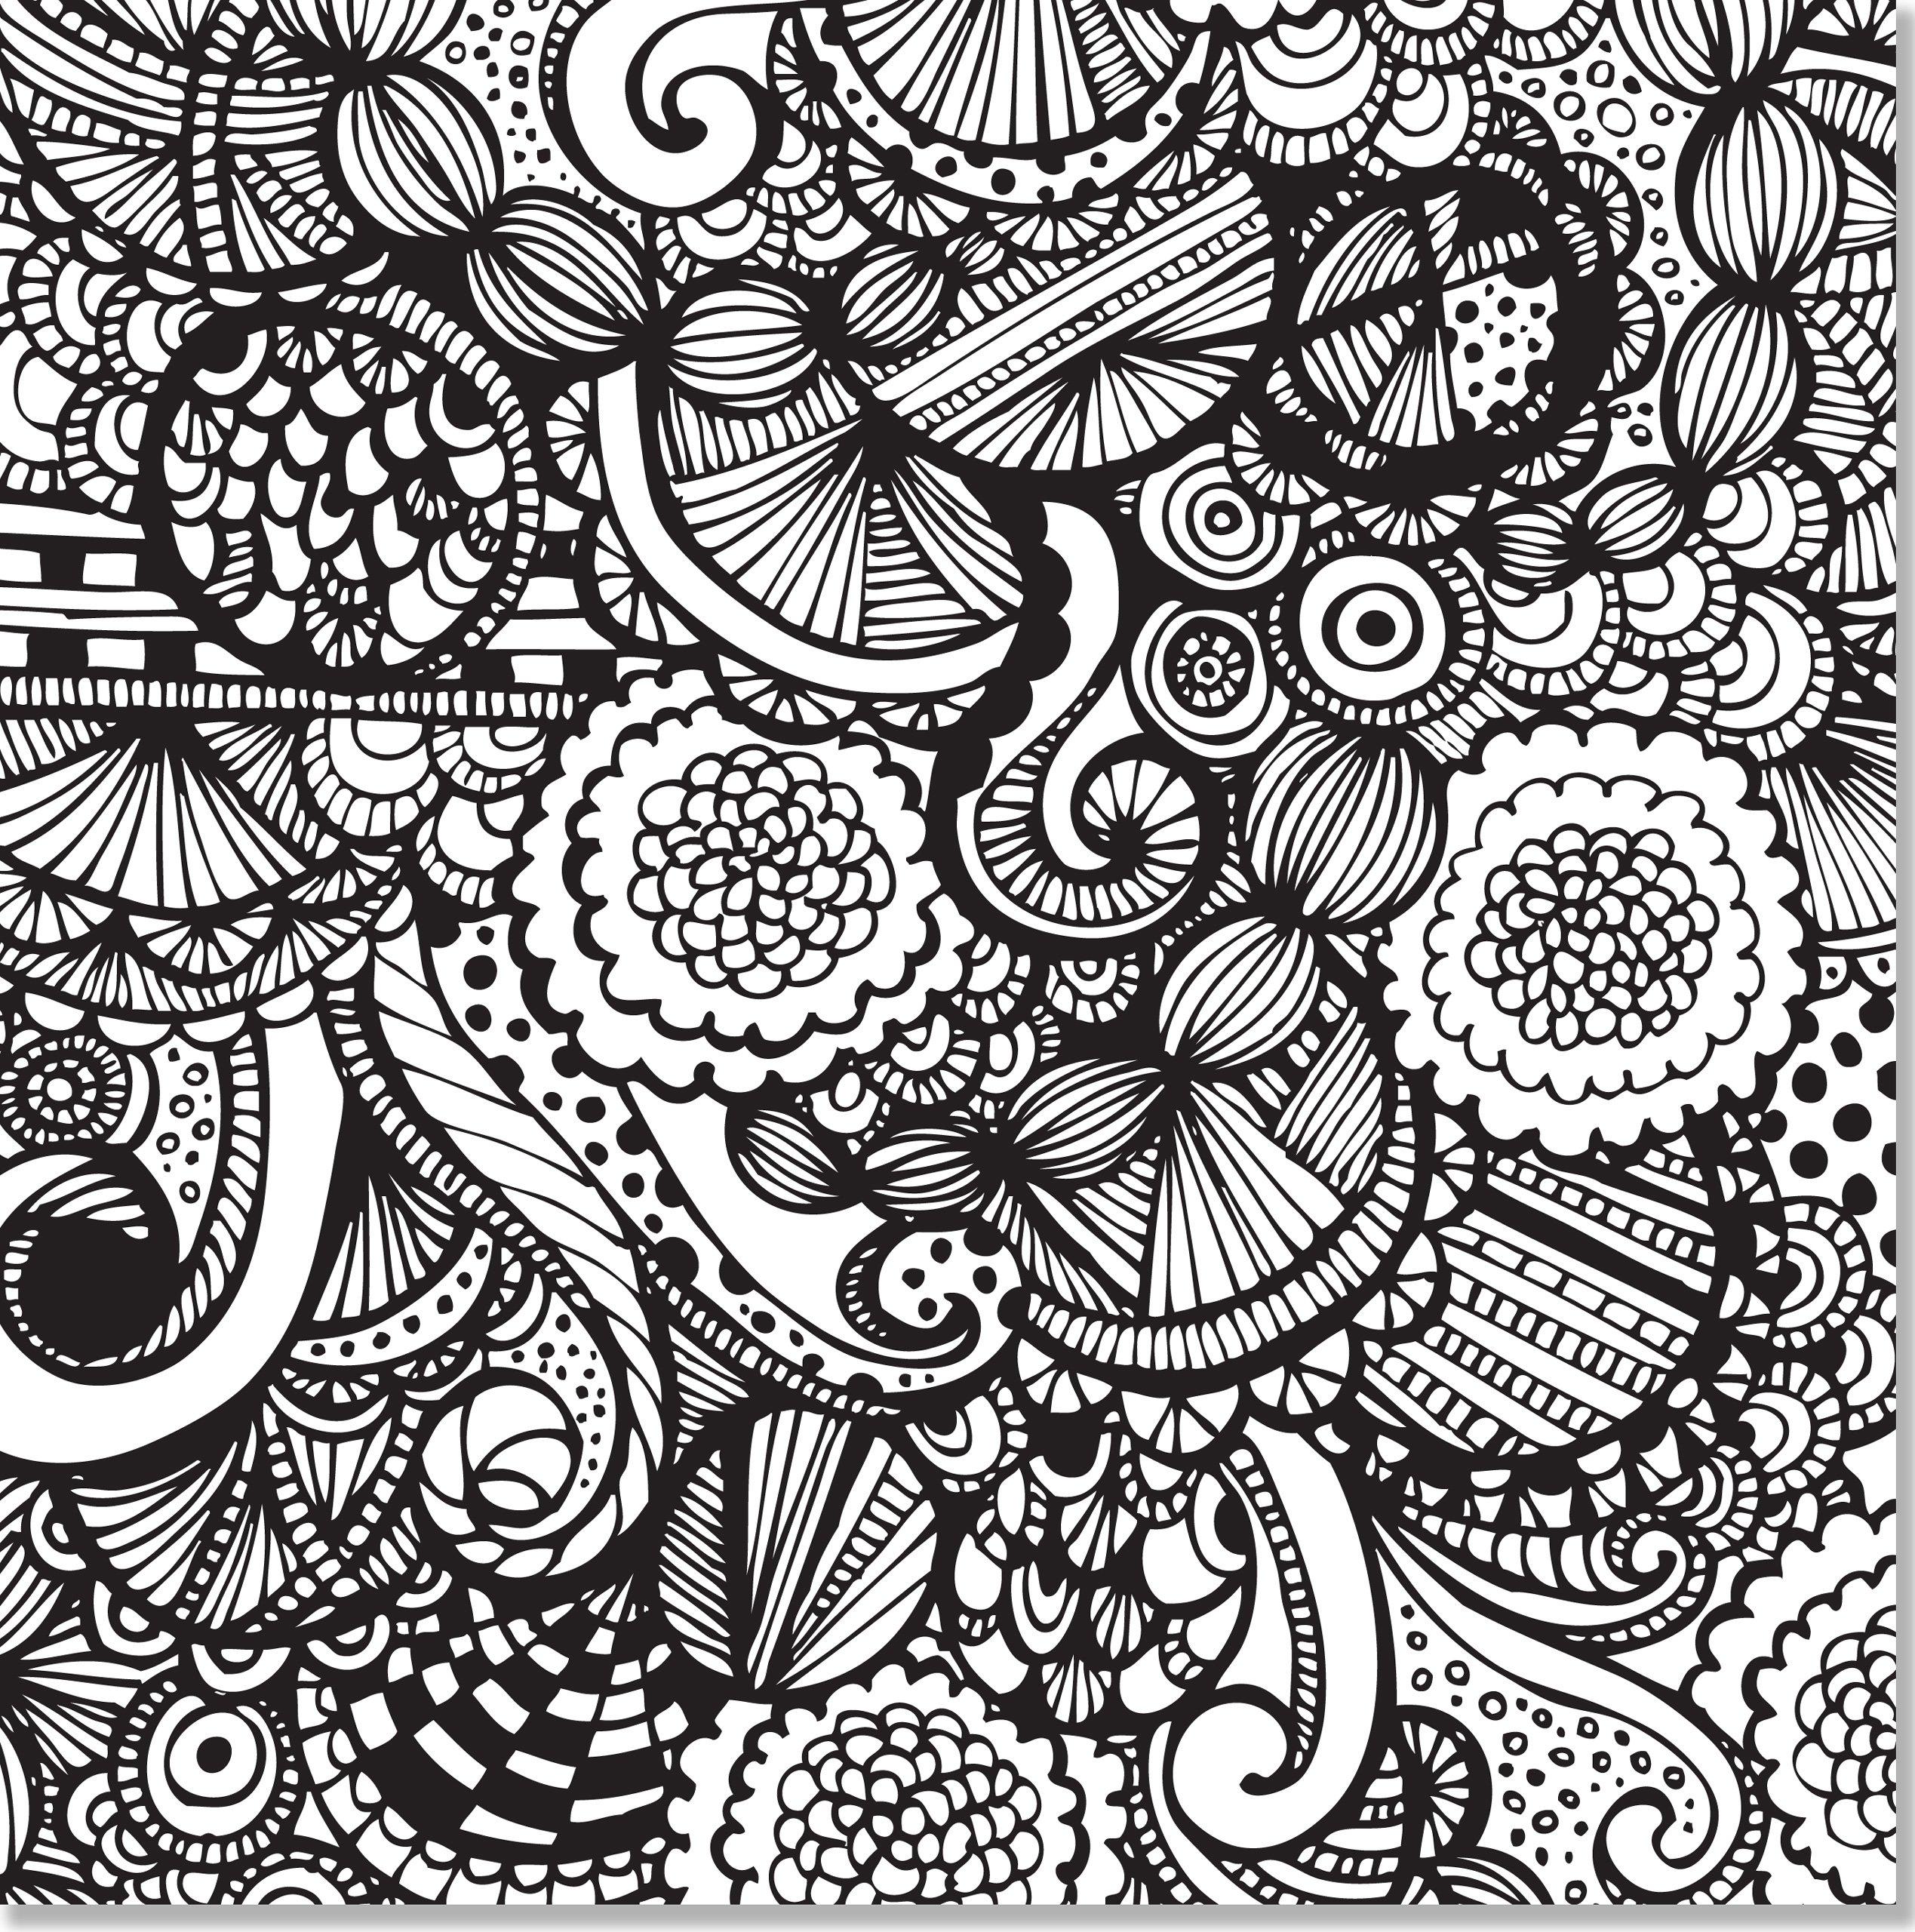 2538x2560 Joyful Designs Adult Coloring Book 31 Stress